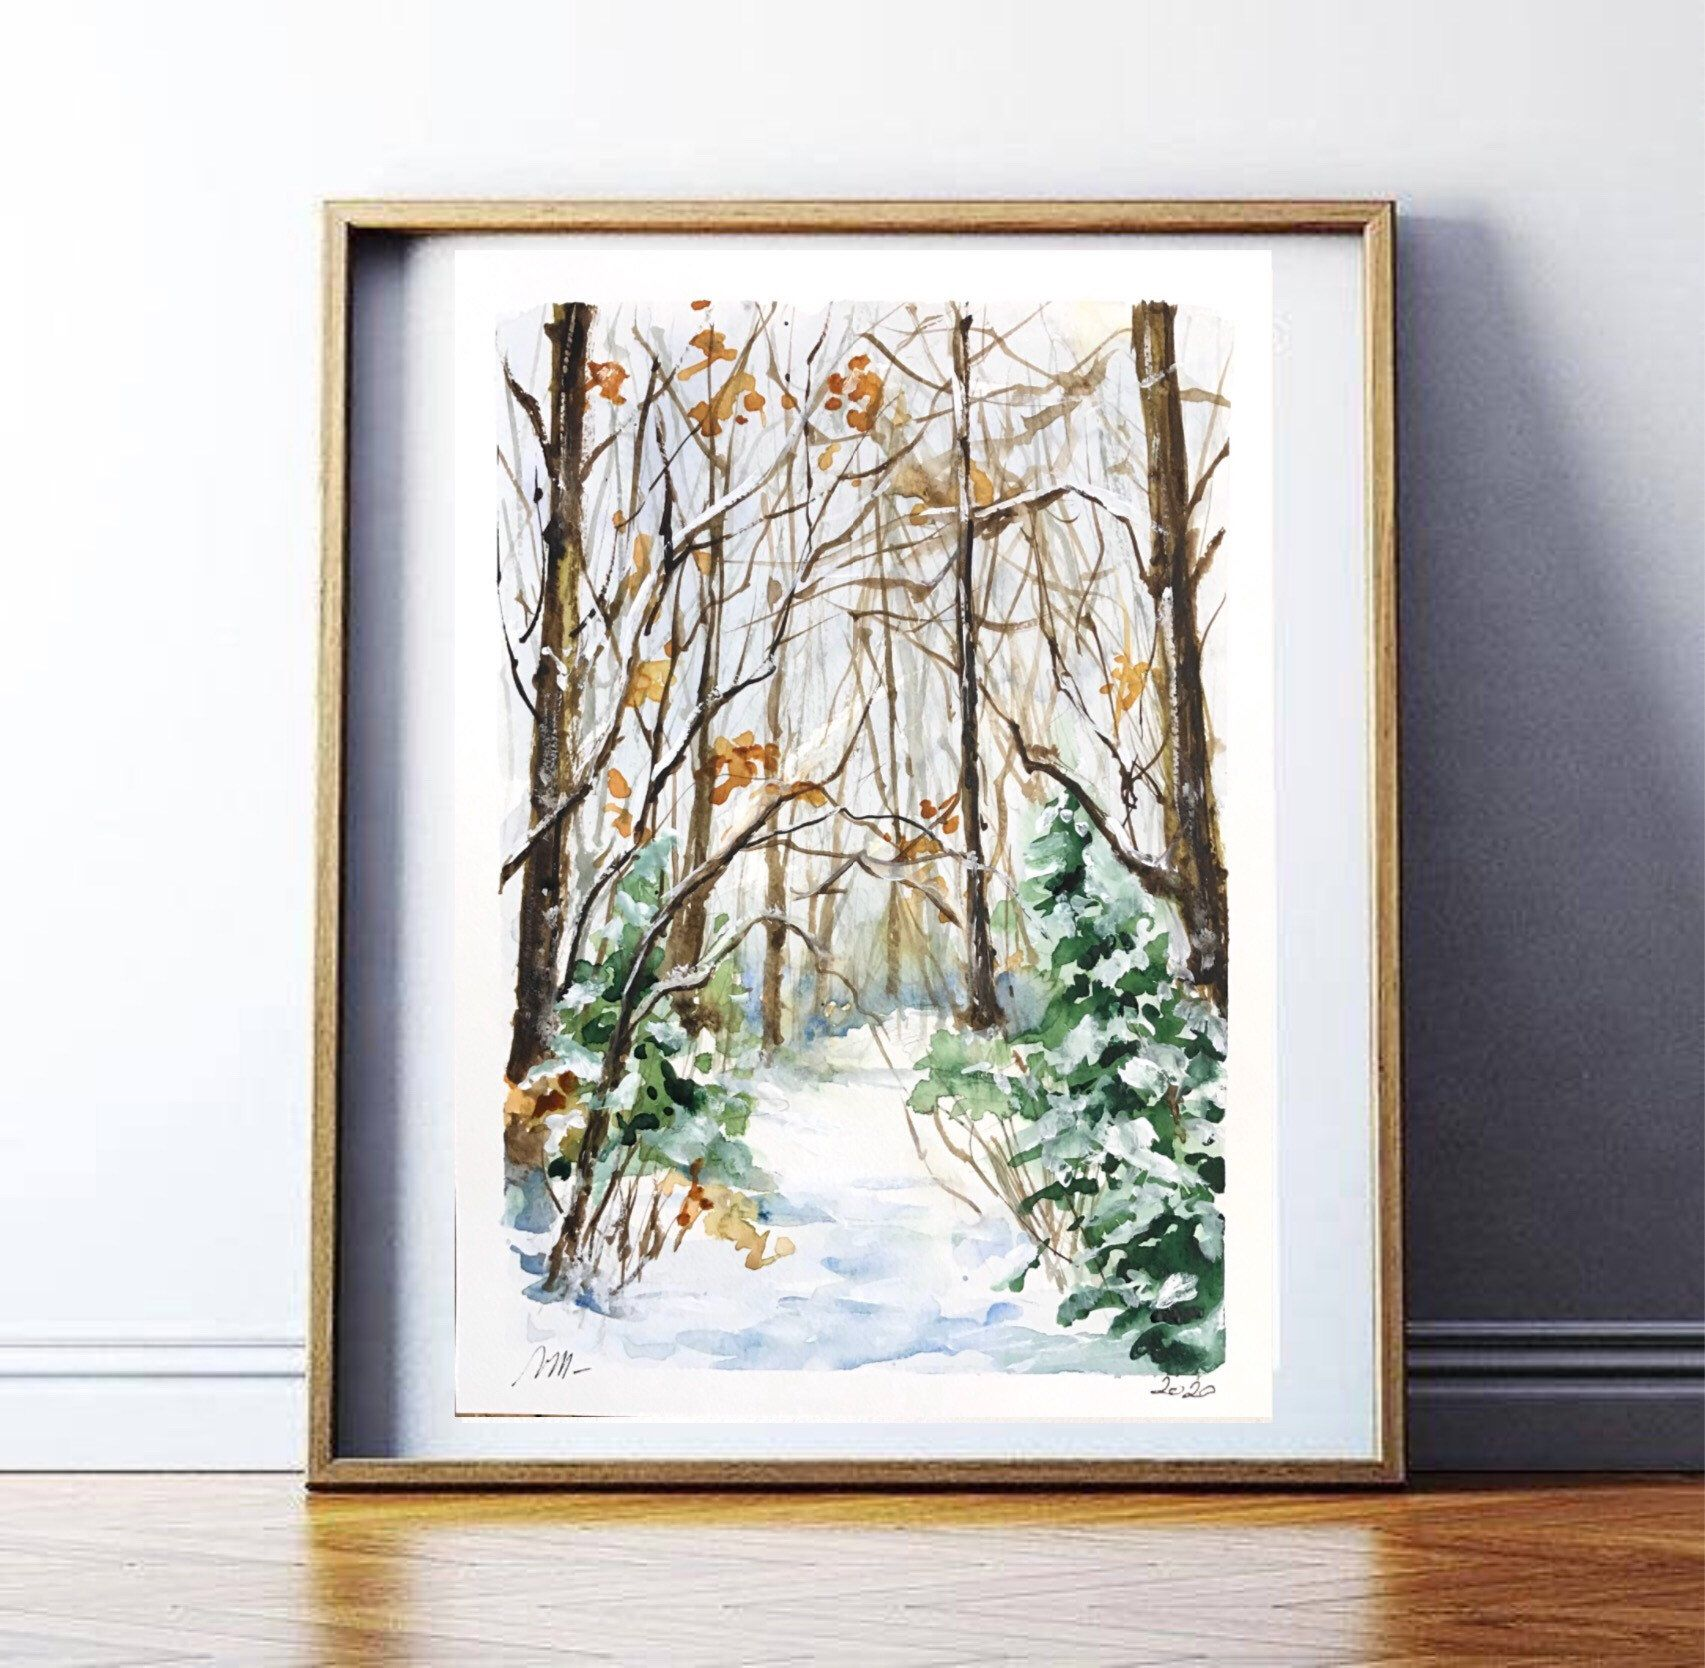 Aquarelle Peinture Originale Chemin En Foret Enneigee Paysage